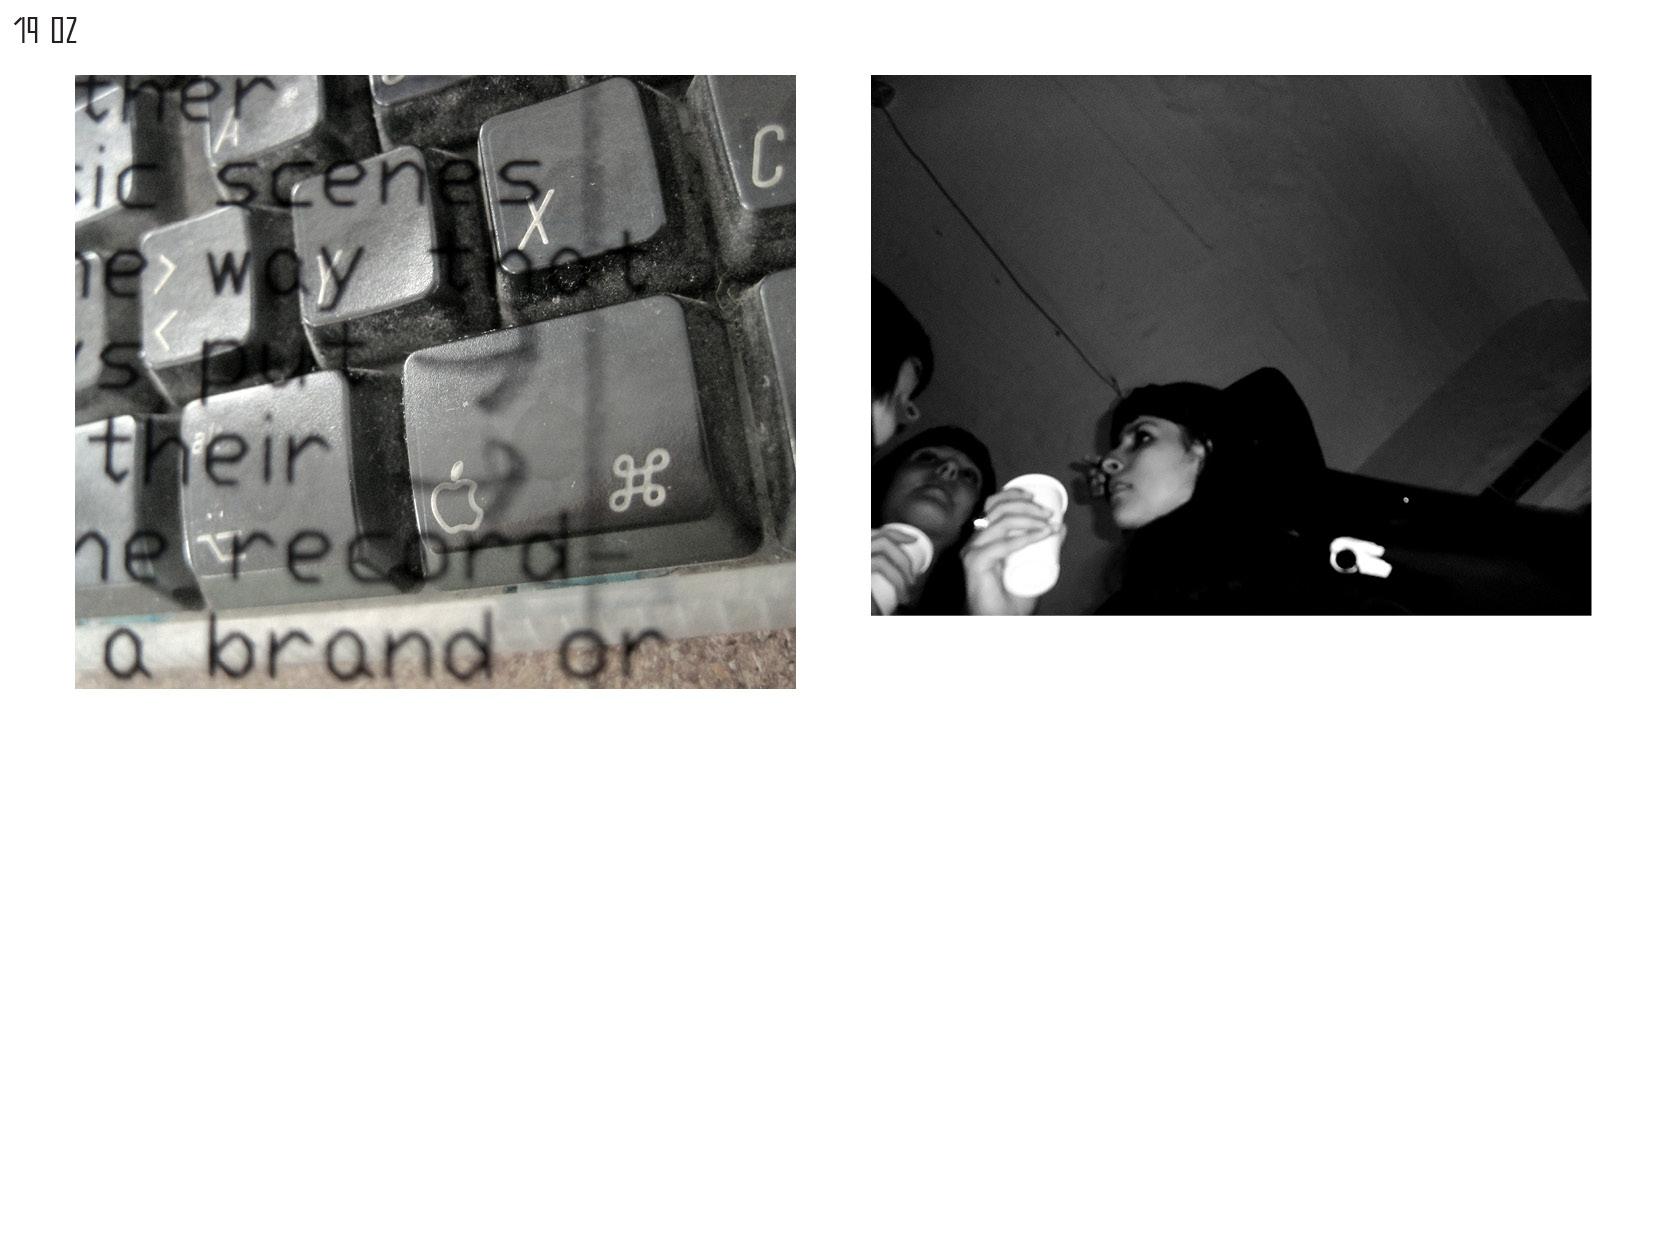 Gerrit-Schweiger-Dialog-Städte-Paris-Berlin-Jessica-Blank-Experiment-Fotoserie-Tagebuch-visuelle-Kommunikation-107